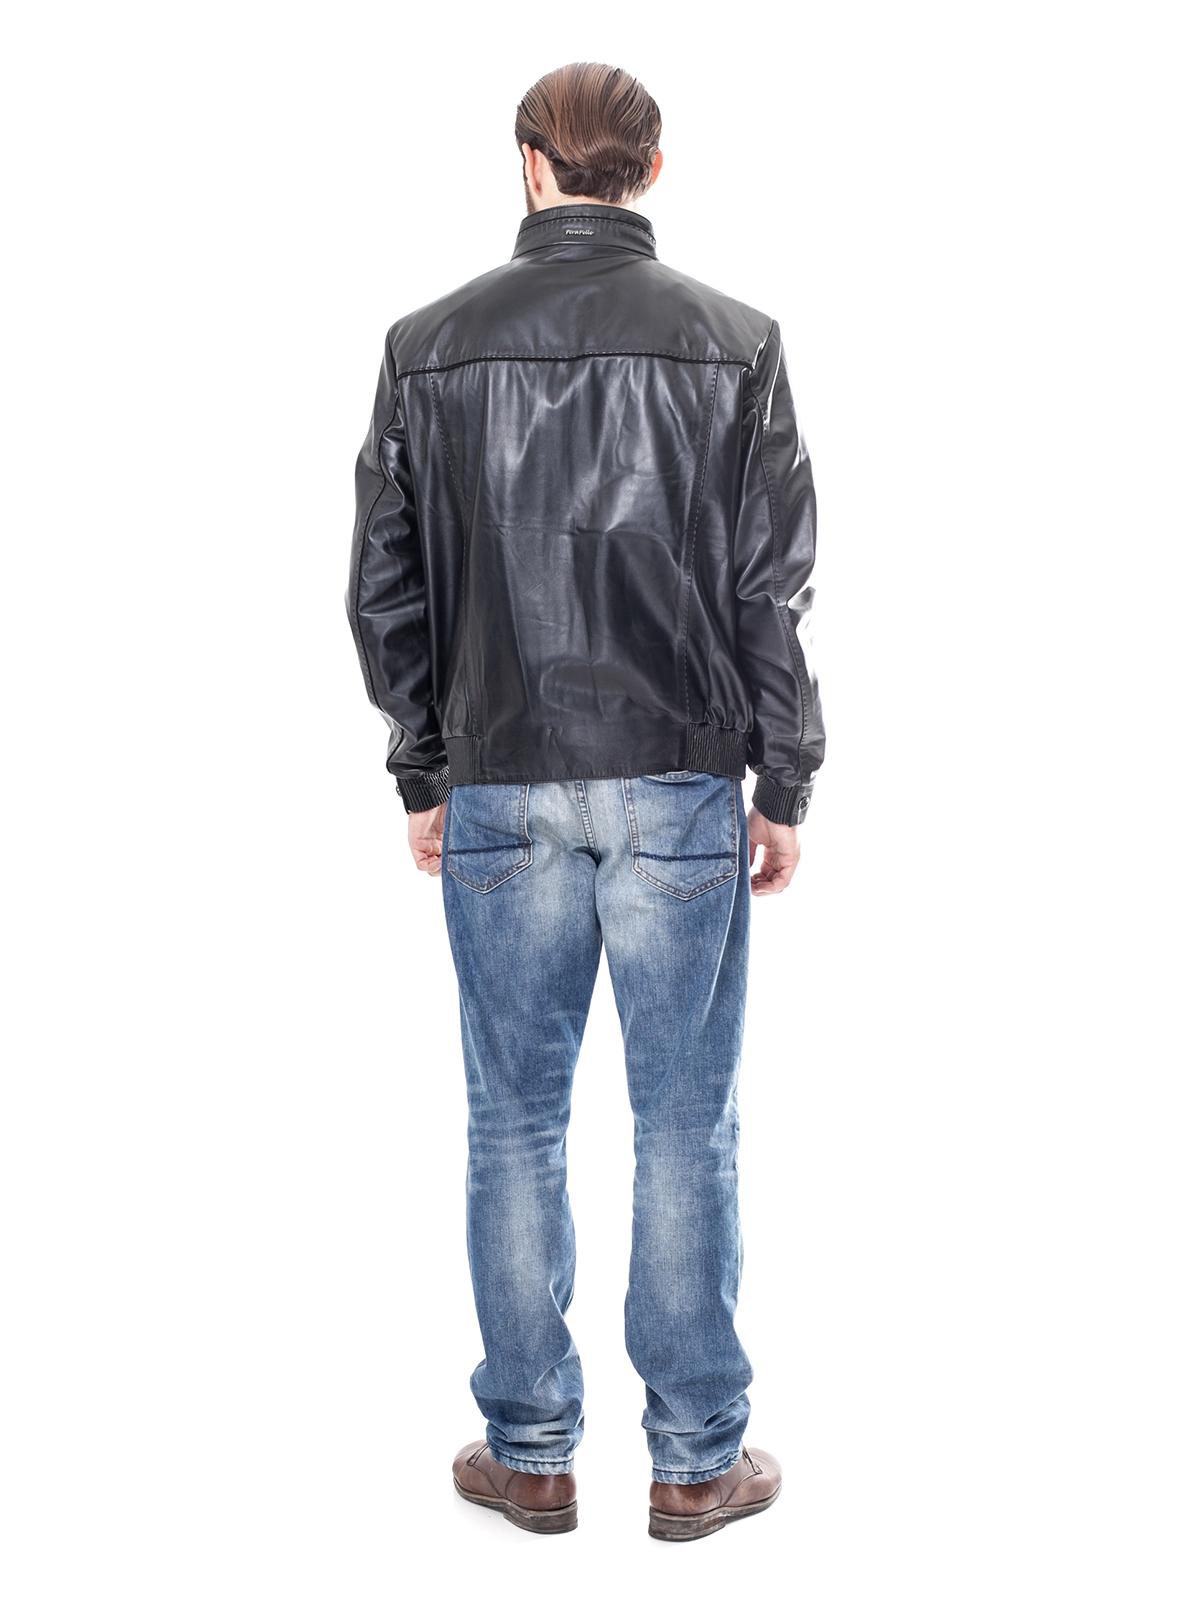 Кожаная куртка pera pelle